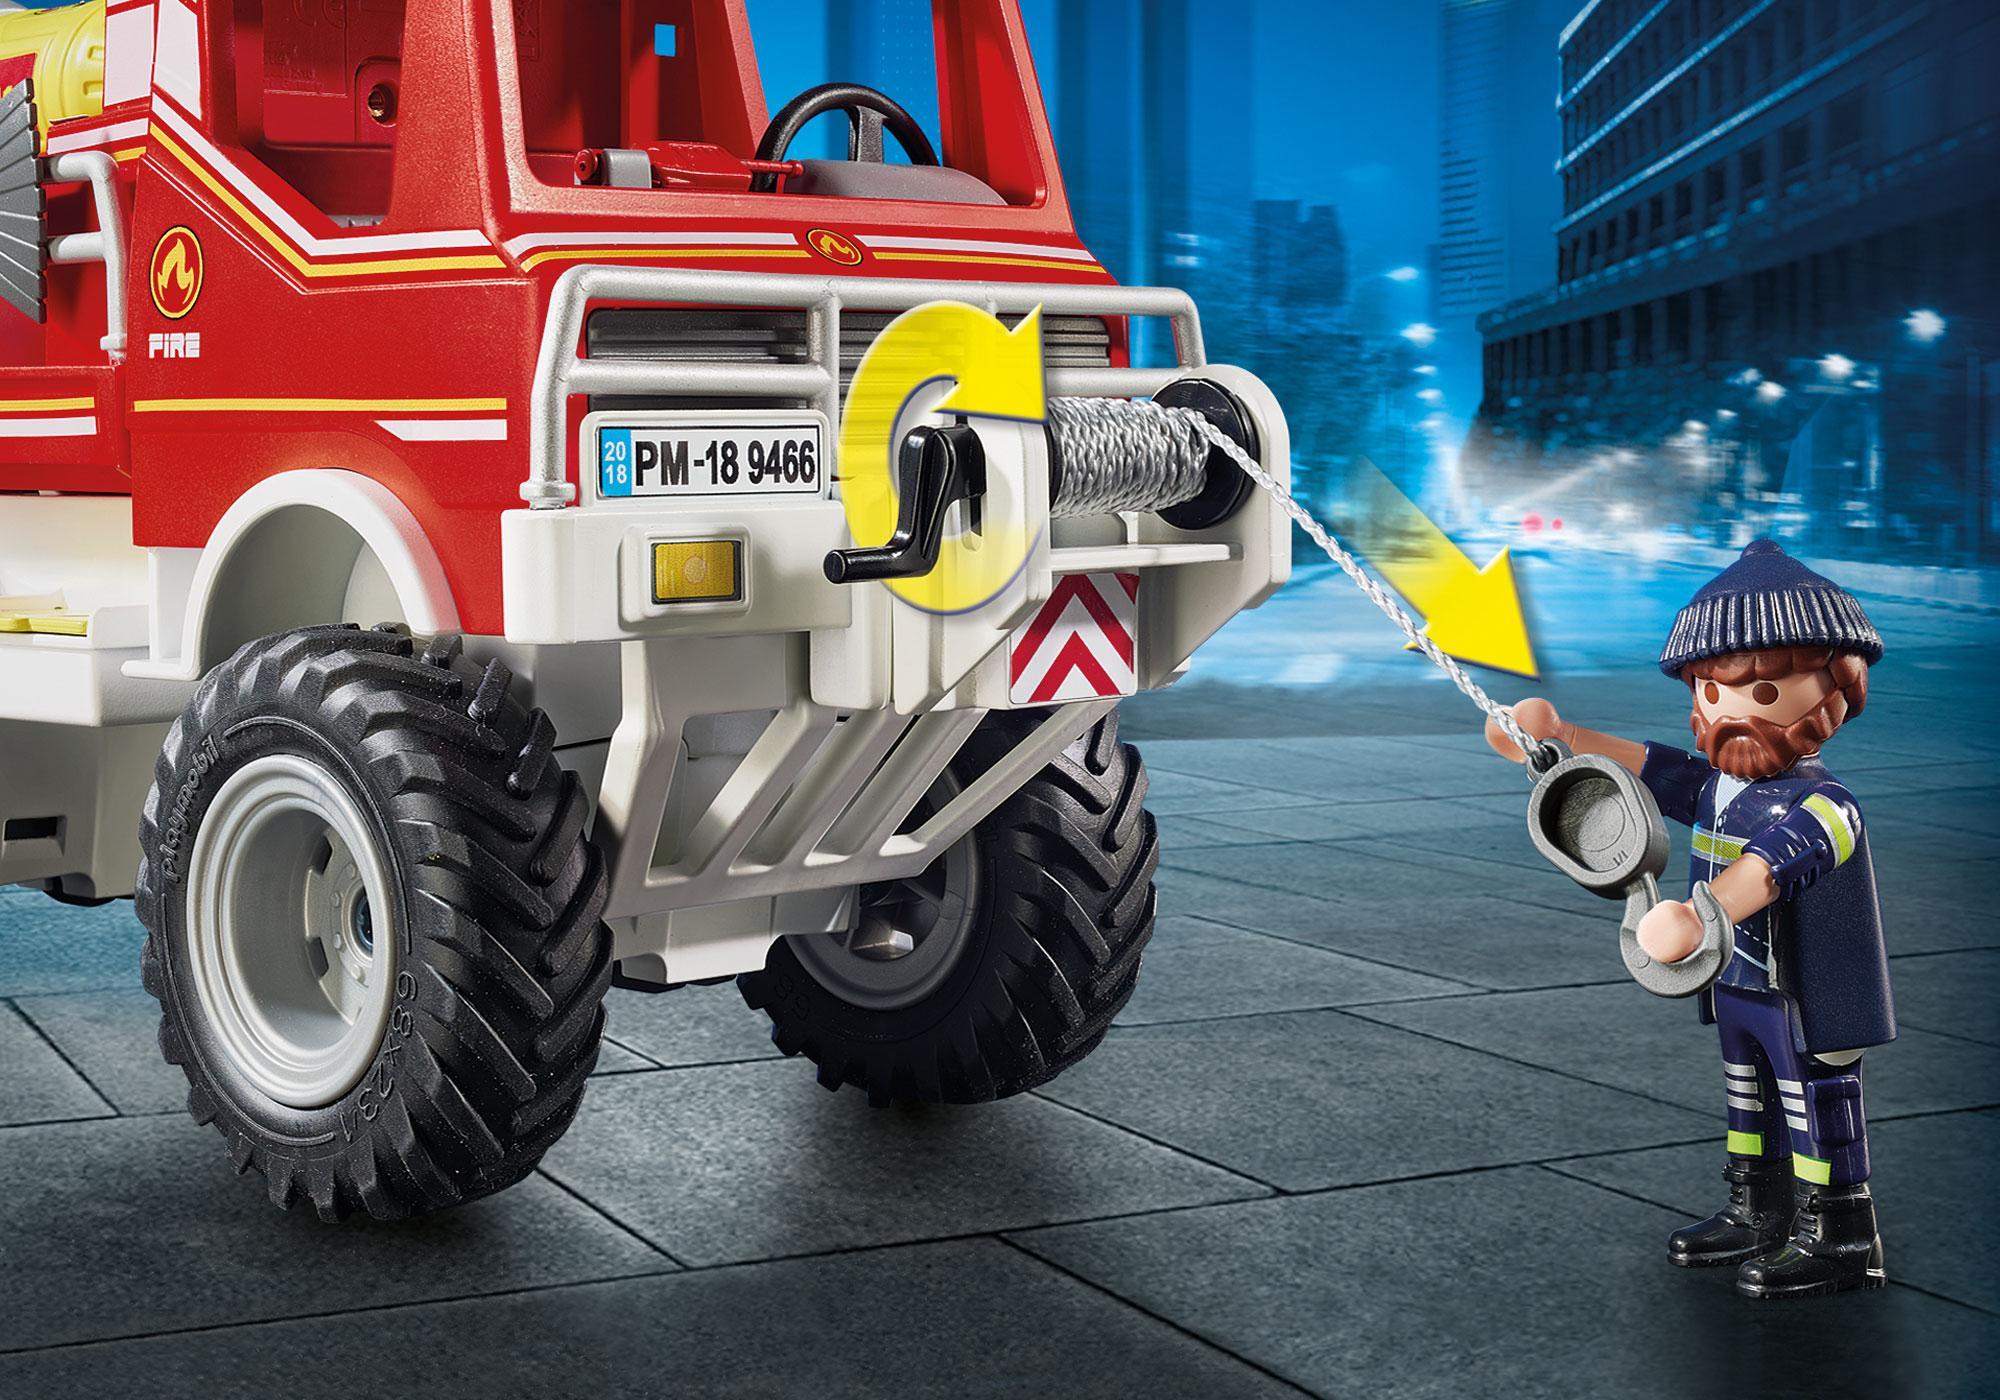 http://media.playmobil.com/i/playmobil/9466_product_extra1/4x4 de pompier avec lance-eau